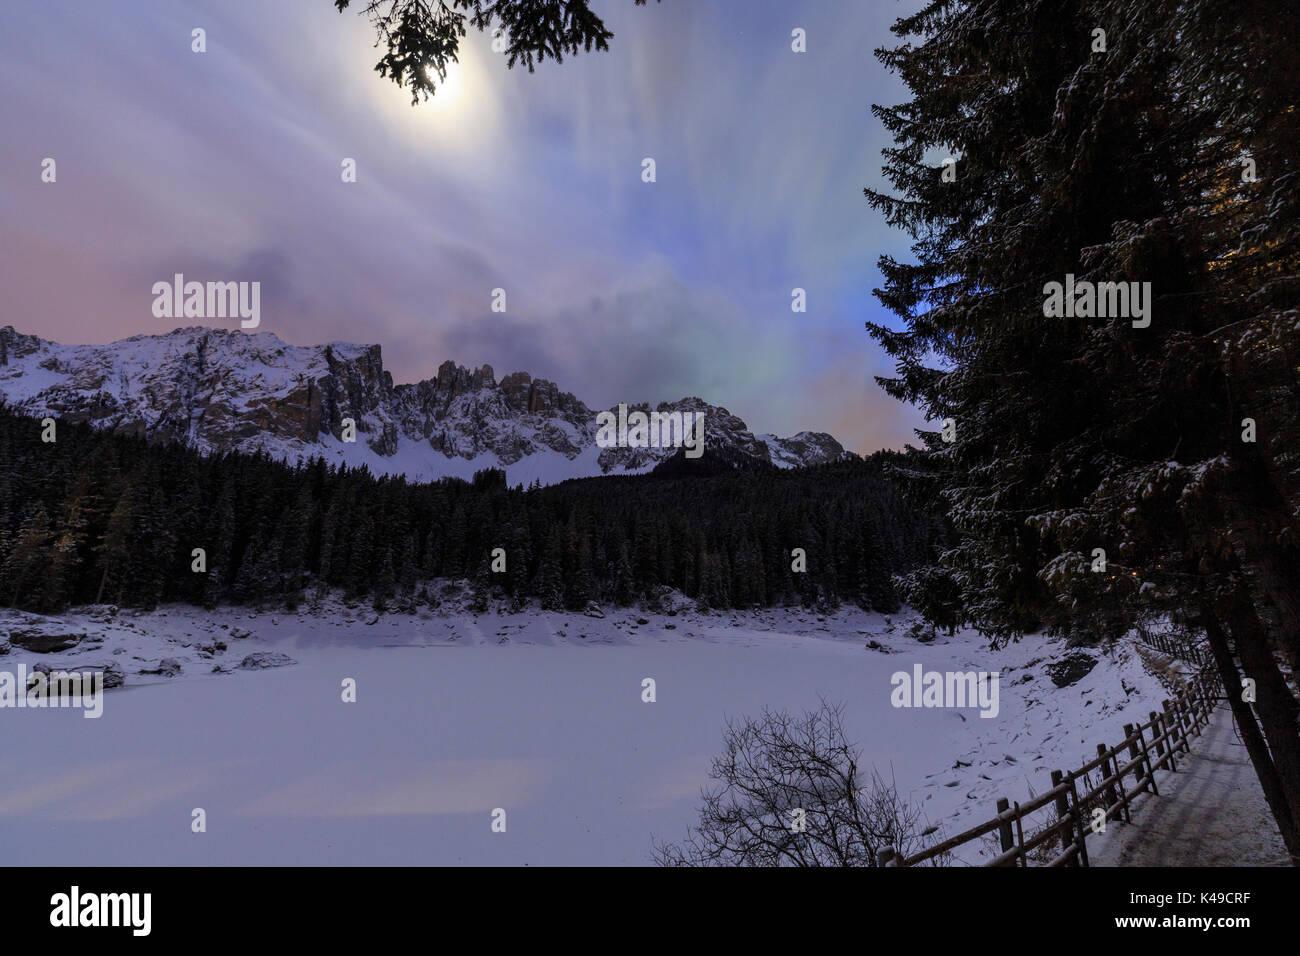 Lake Moon Night Stock Photos & Lake Moon Night Stock Images - Alamy